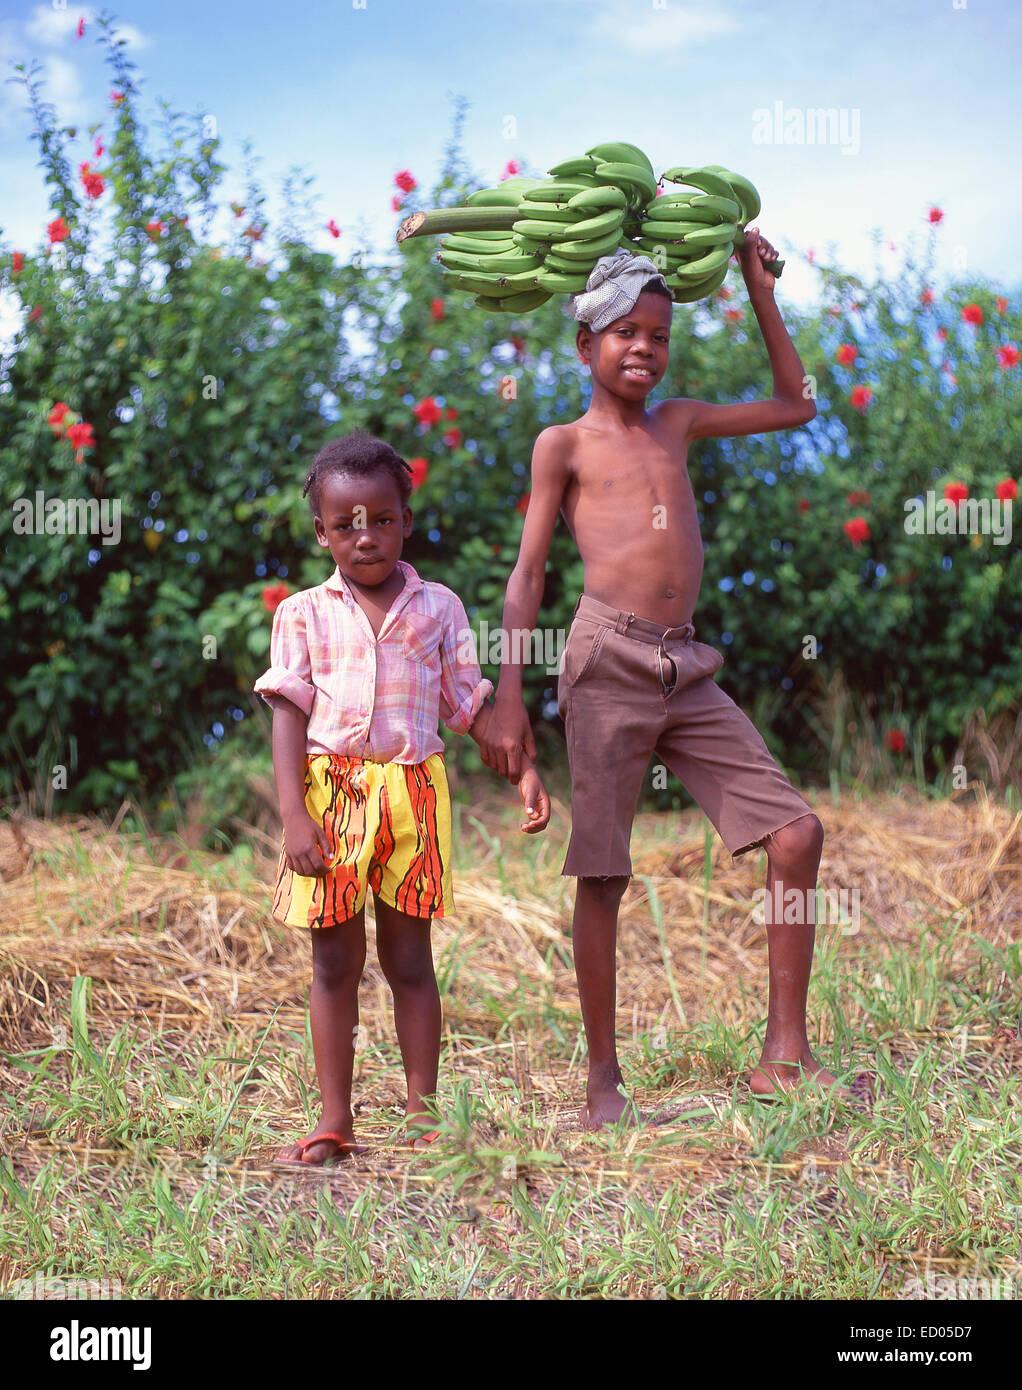 Young boy carrying bunch of bananas, Ocho Ríos, Saint Ann Parish, Jamaica, Greater Antilles, Caribbean - Stock Image